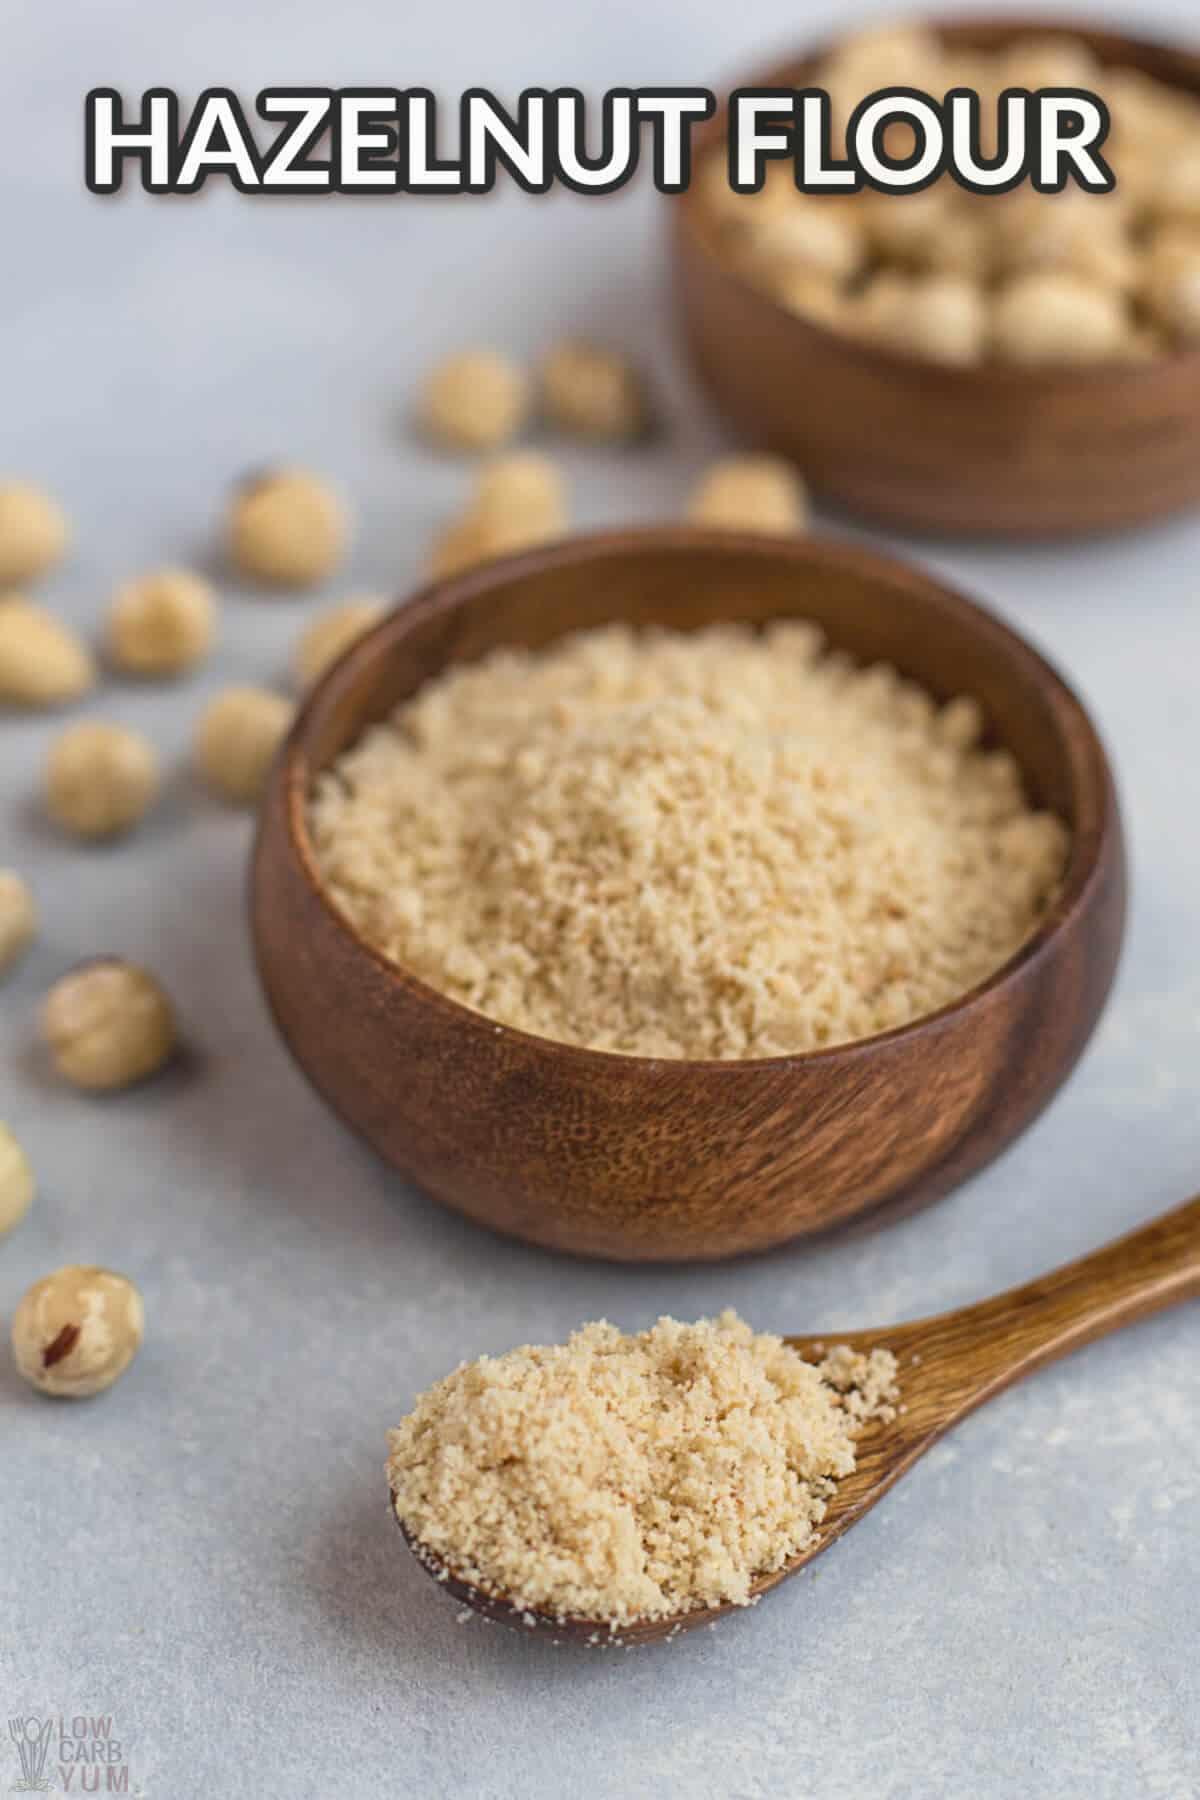 hazelnut flour cover image